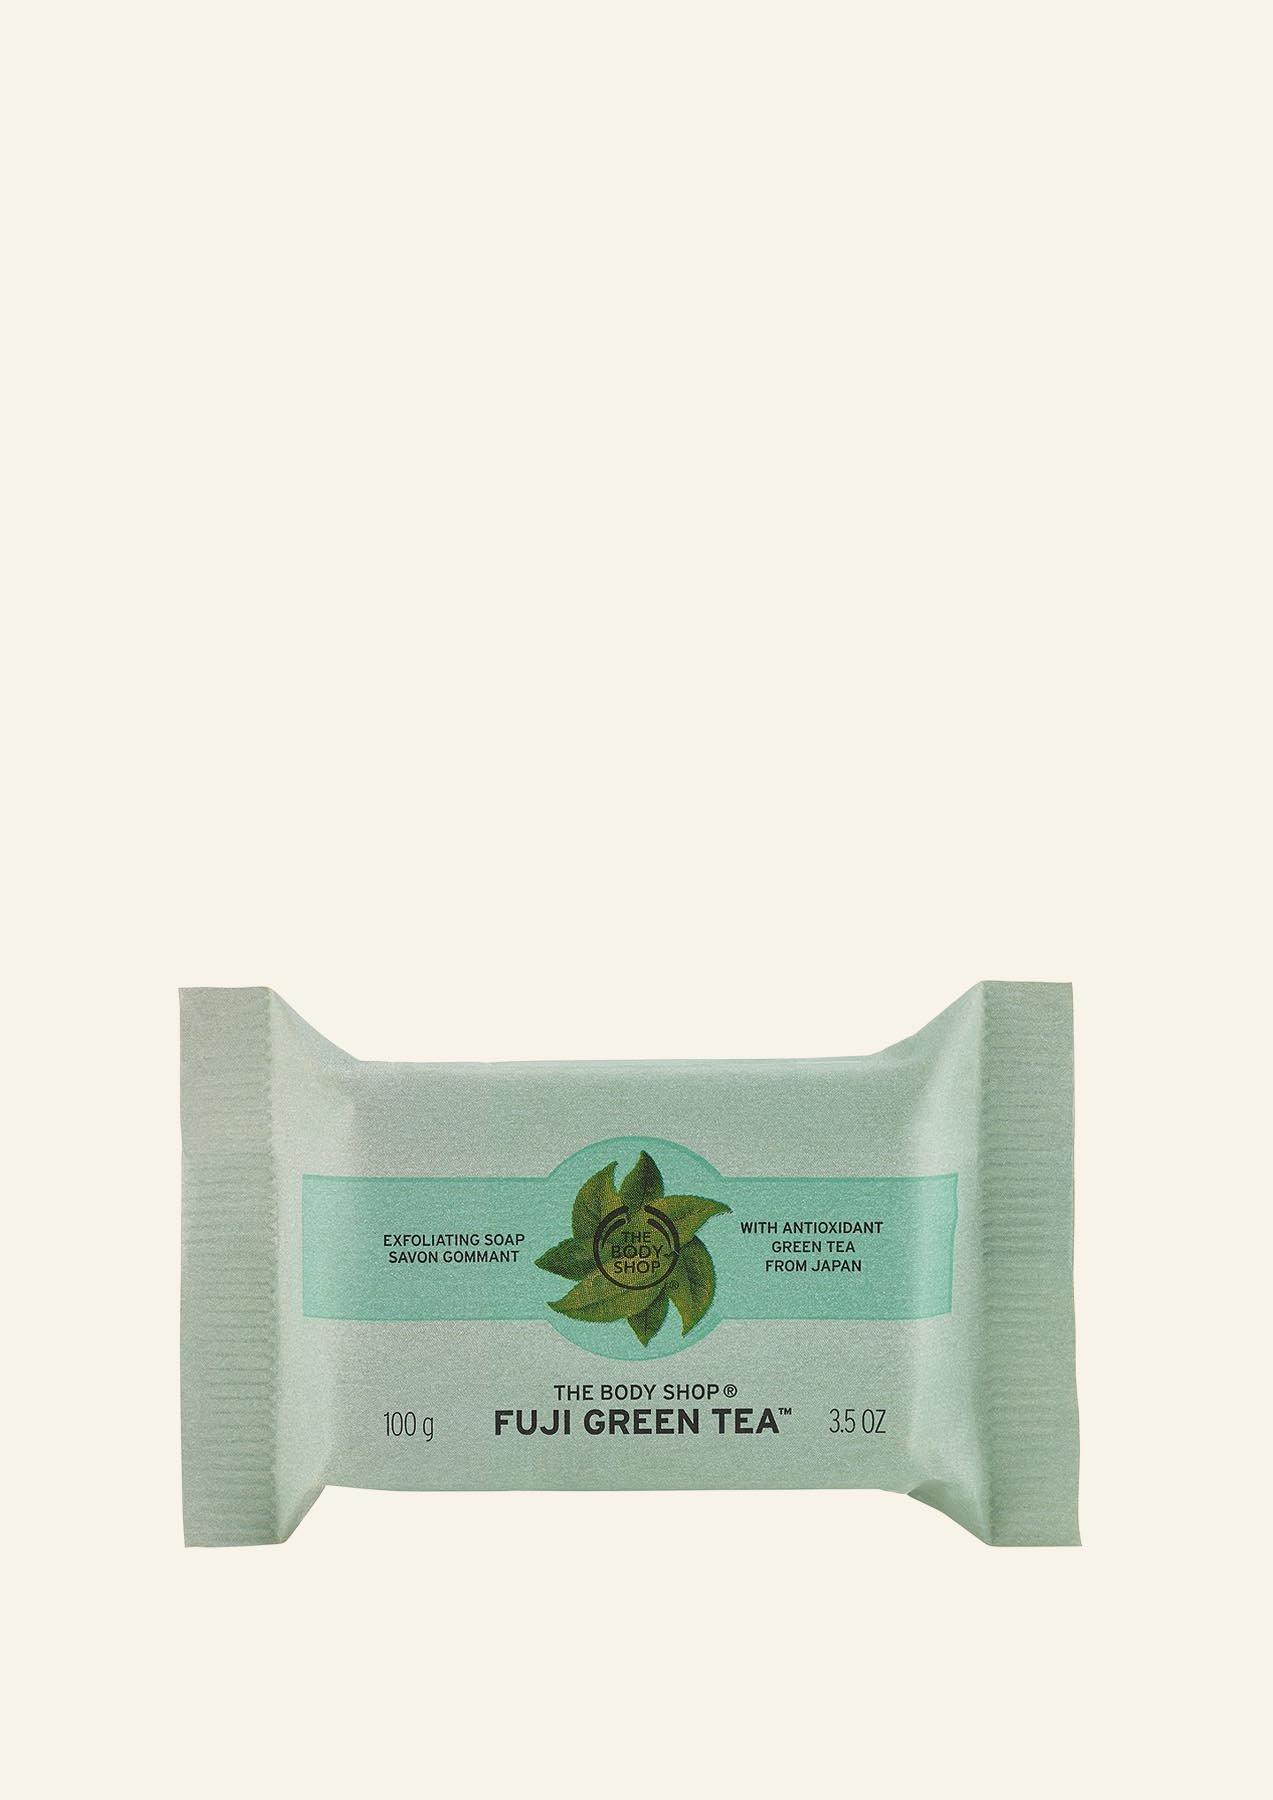 Sapun eksfoliues Fuji Green Tea